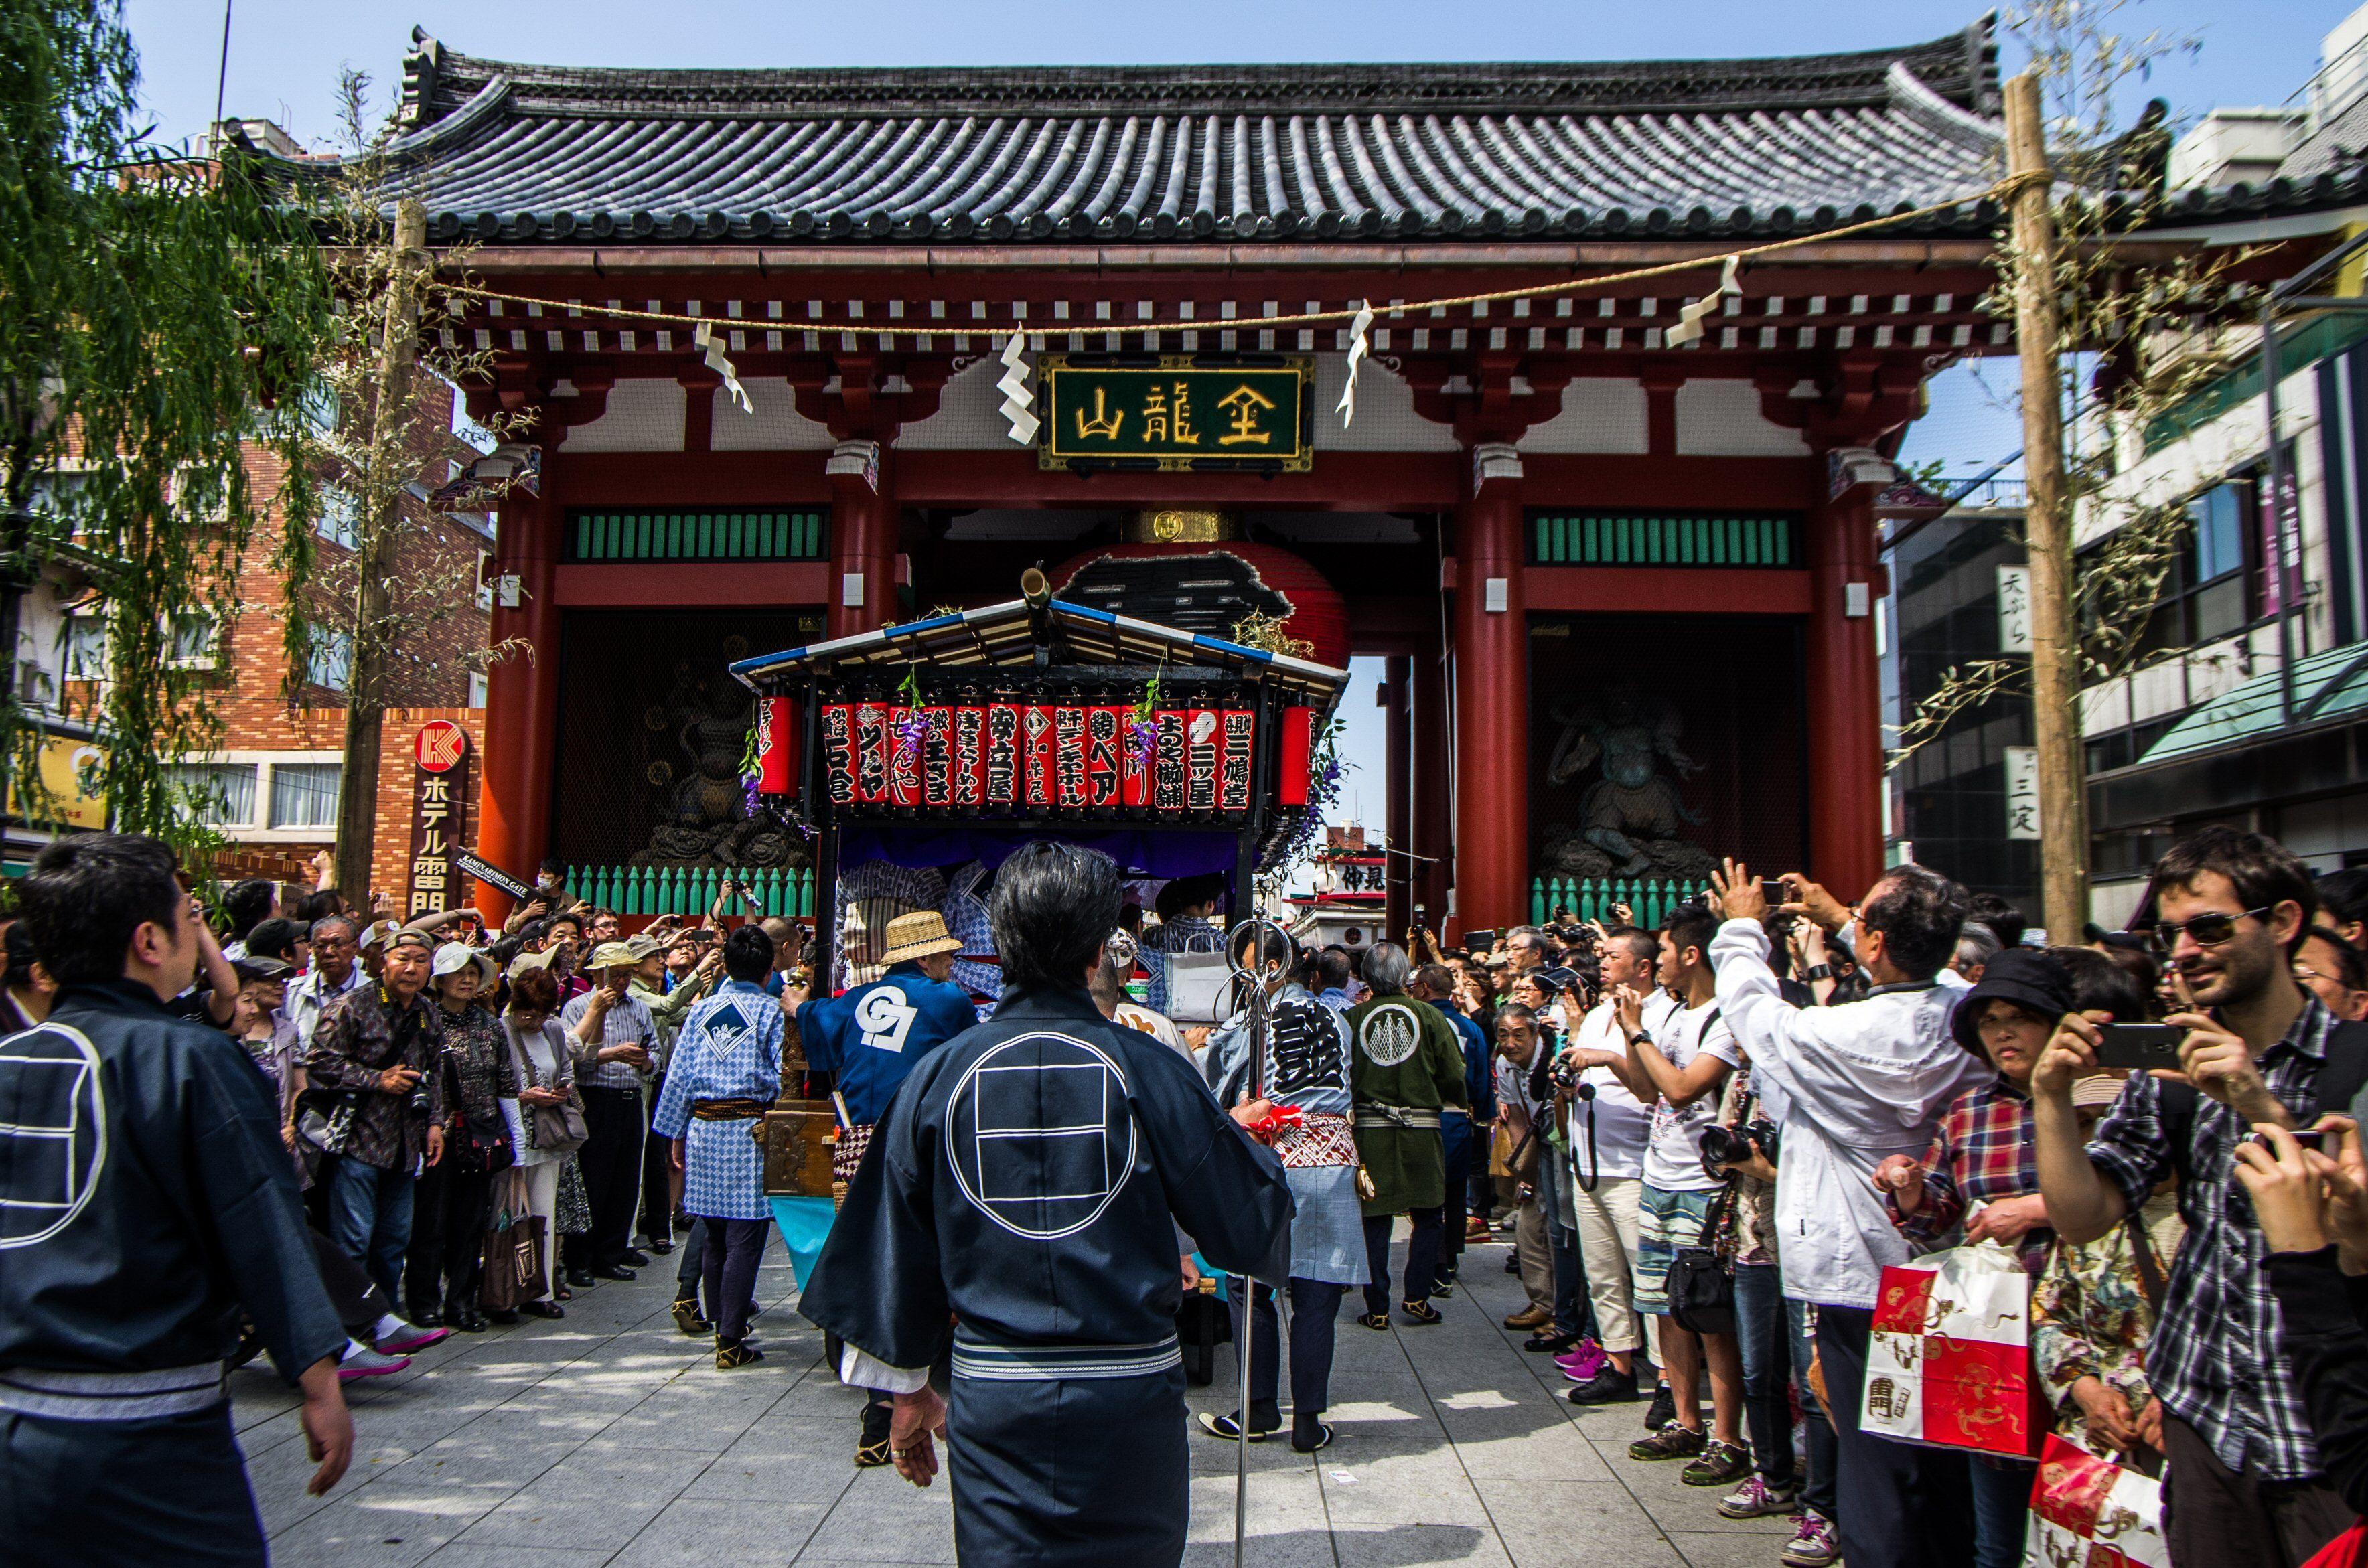 Asakusa Sanja Matsuri parade 13/17 The parade passing under the Kaminarimon gate -the huge chochin lantern-trademark of the gate is being collapsed during the matsuri to allow the floats and omikoshi to pass. #Asakusa, #Sanja, #Matsuri, #parade, #Kaminarimon, Taken on May 16, 2014. © Grigoris A. Miliaresis